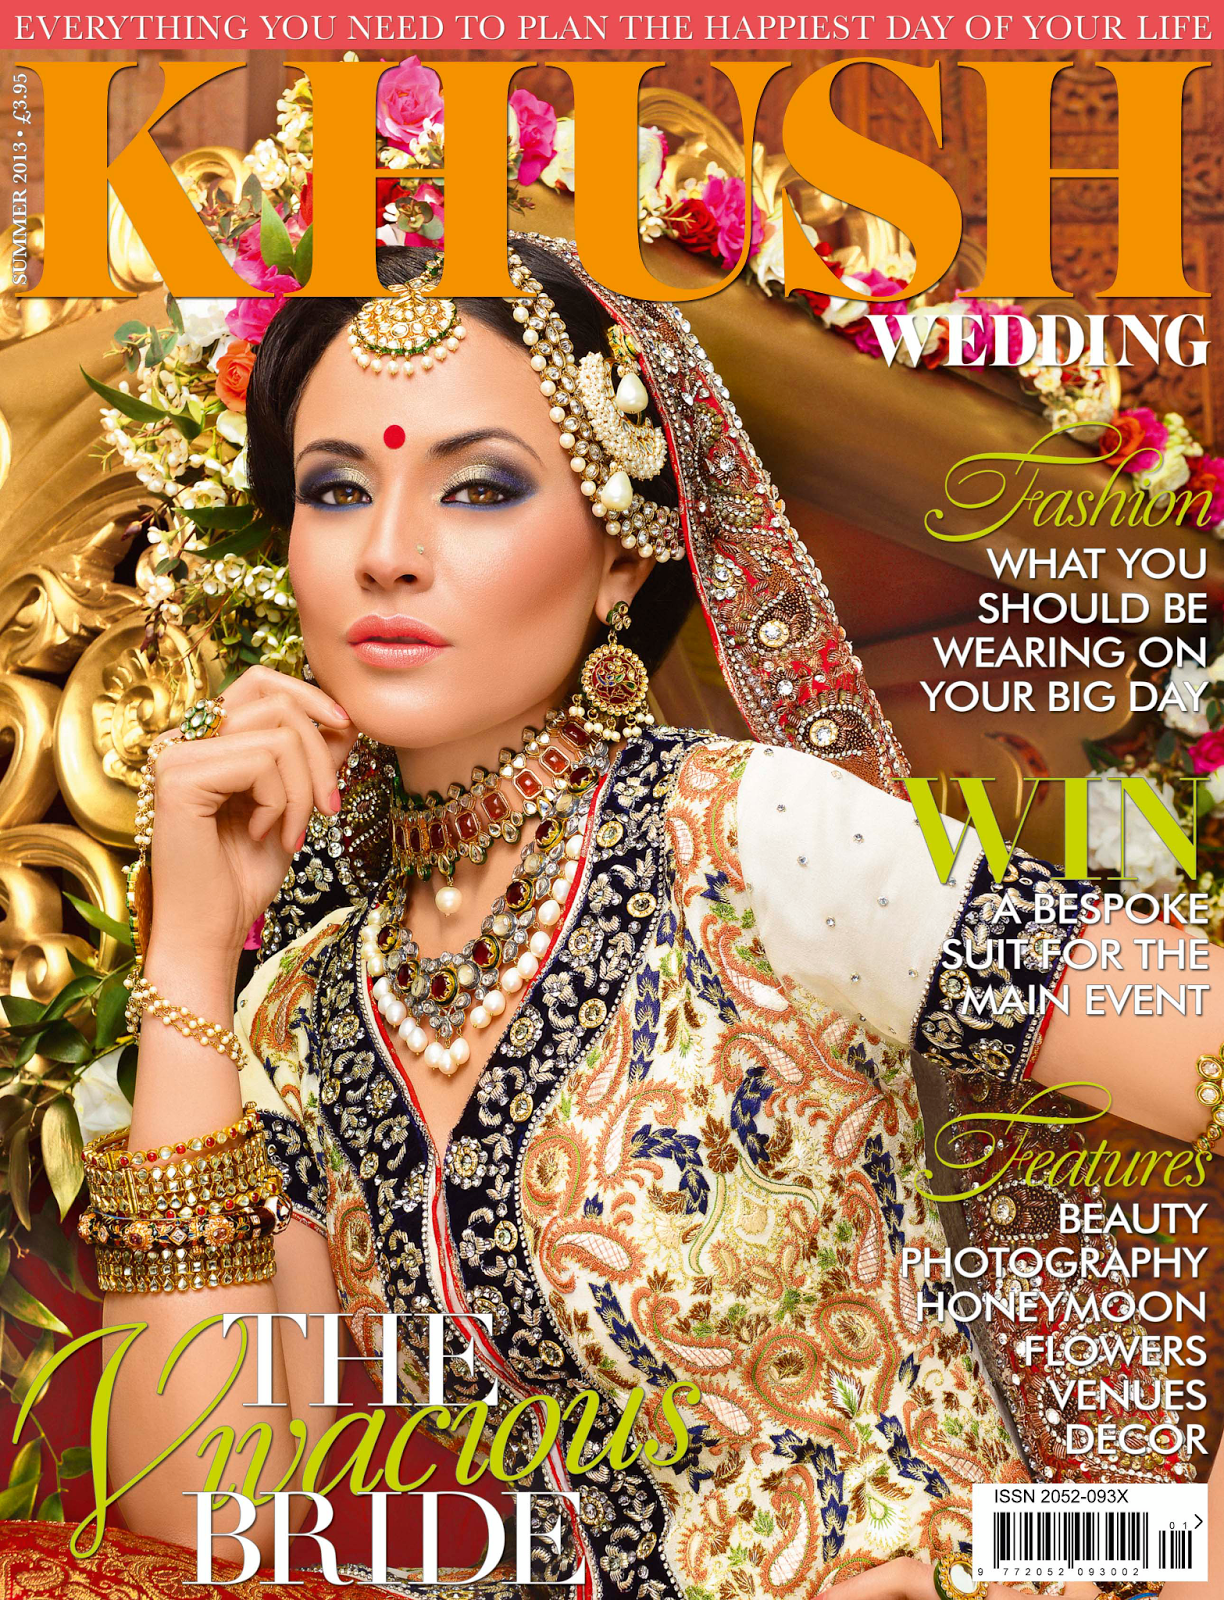 Asian Fashion Blog Khush Wedding Magazine First Issue Summer 2017